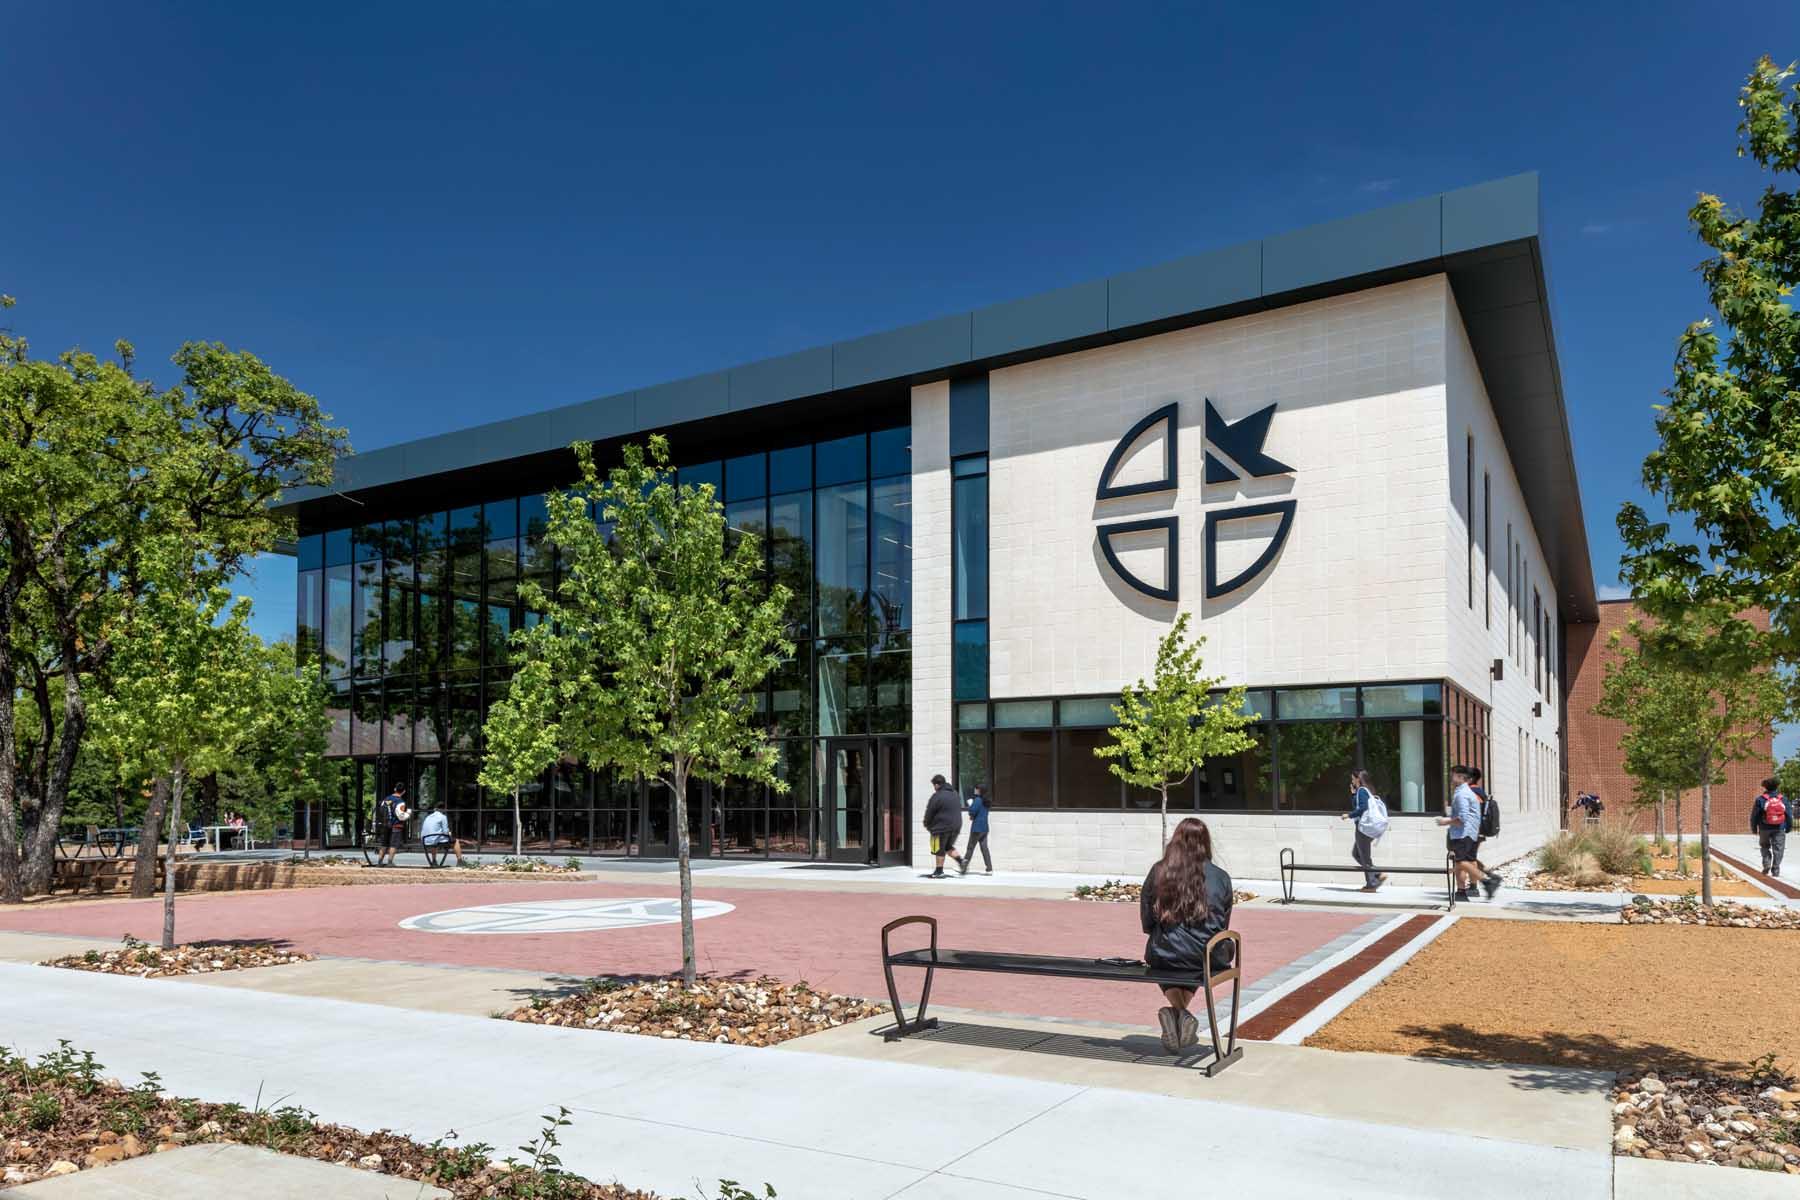 Cristo Rey Dallas Innovation Center, Front